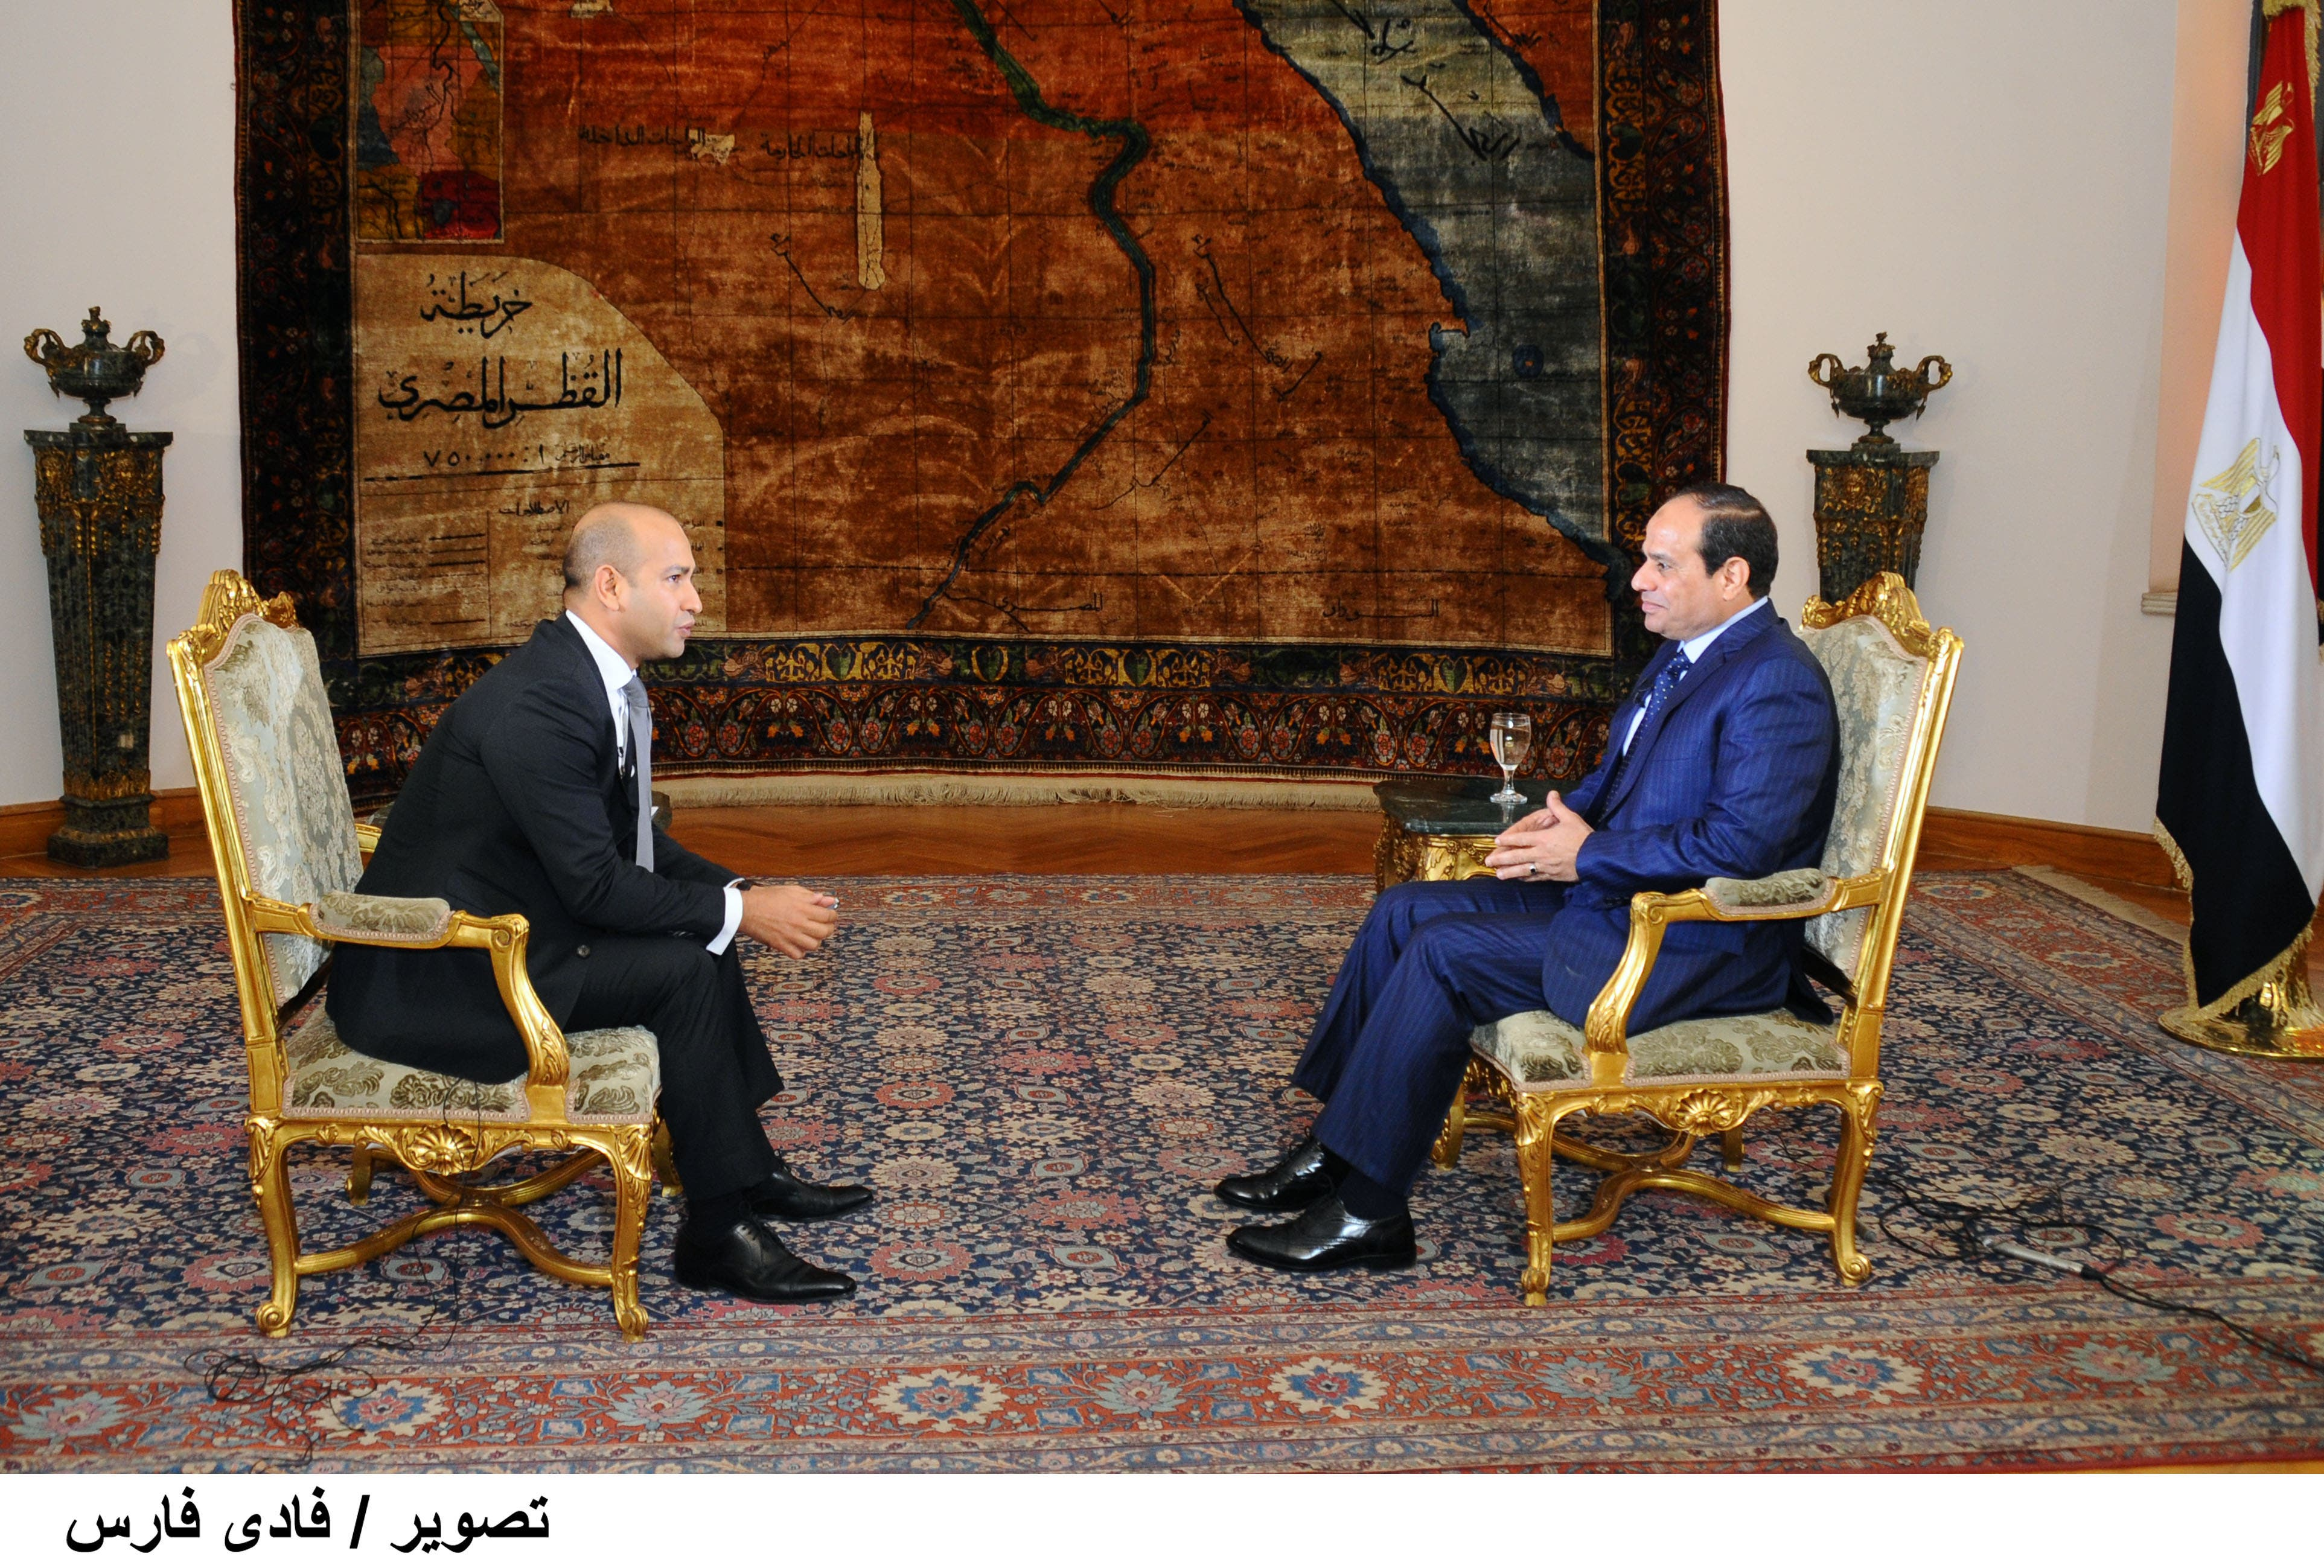 Egyptian President Abdel Fattah al-Sisi AA